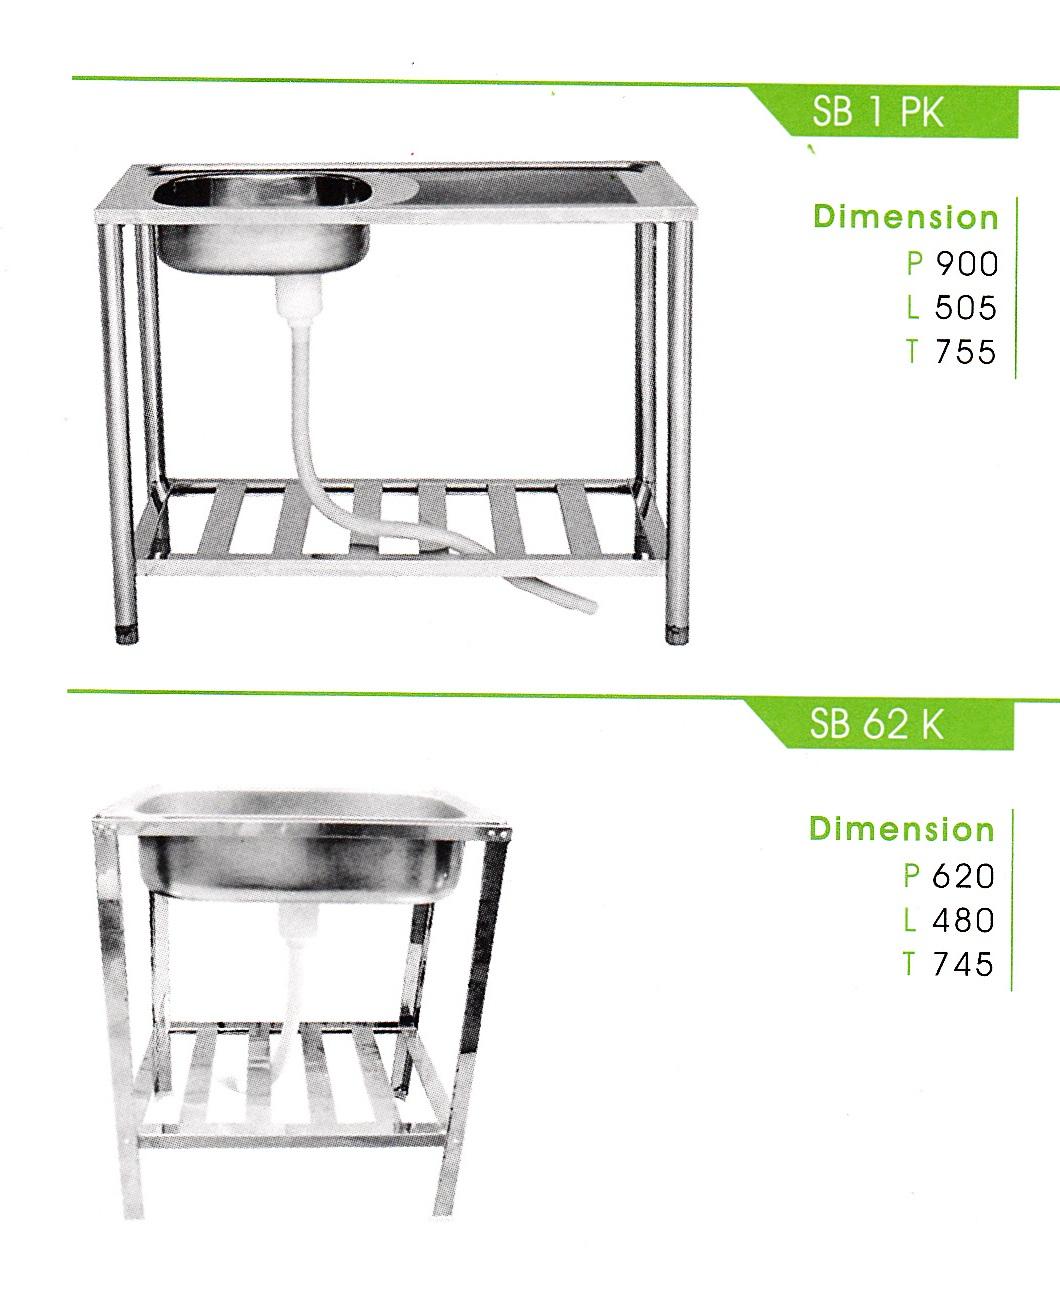 Harga Kitchen Sink Portable Images